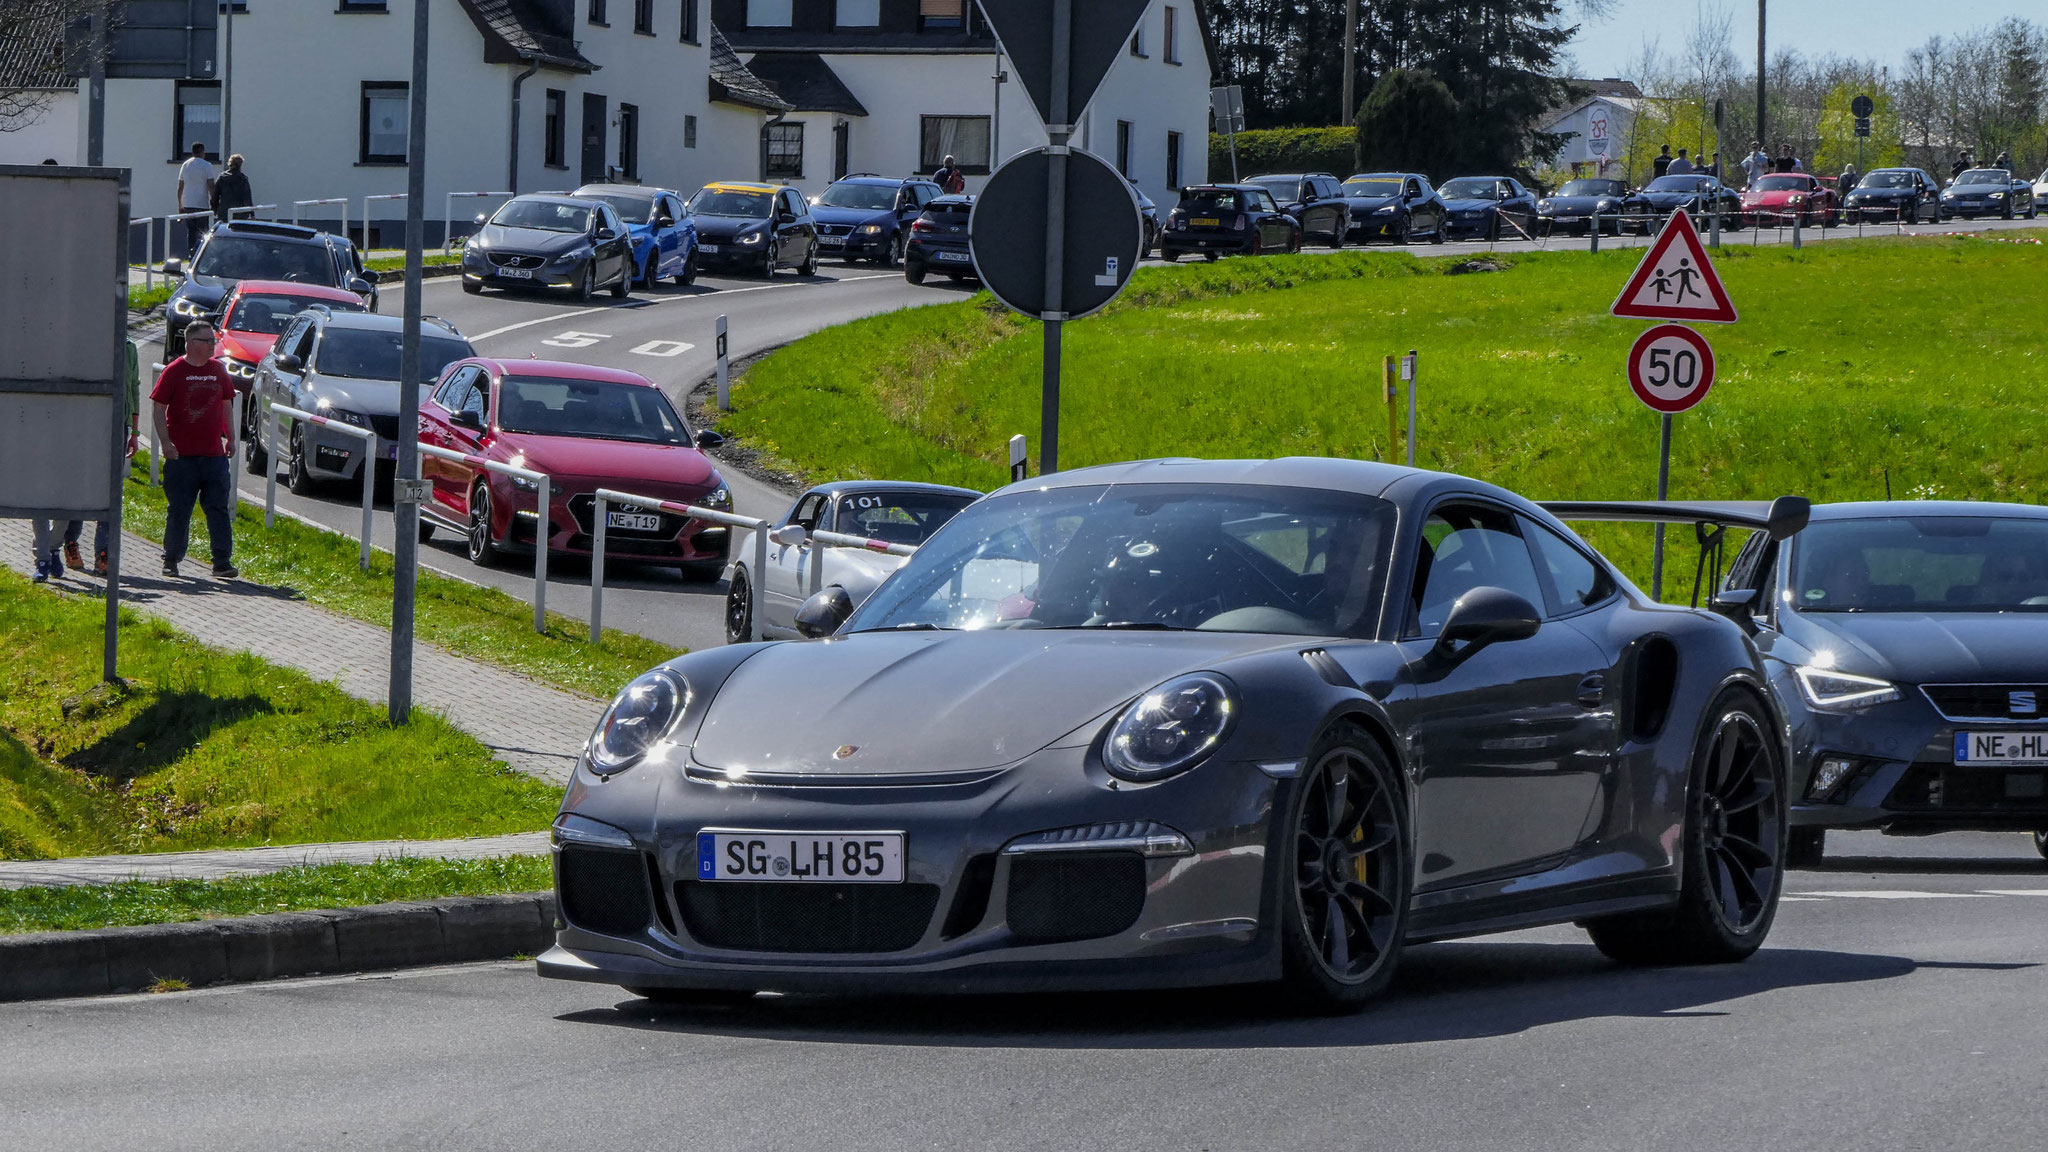 Porsche 911 GT3 RS - SG-LH-85